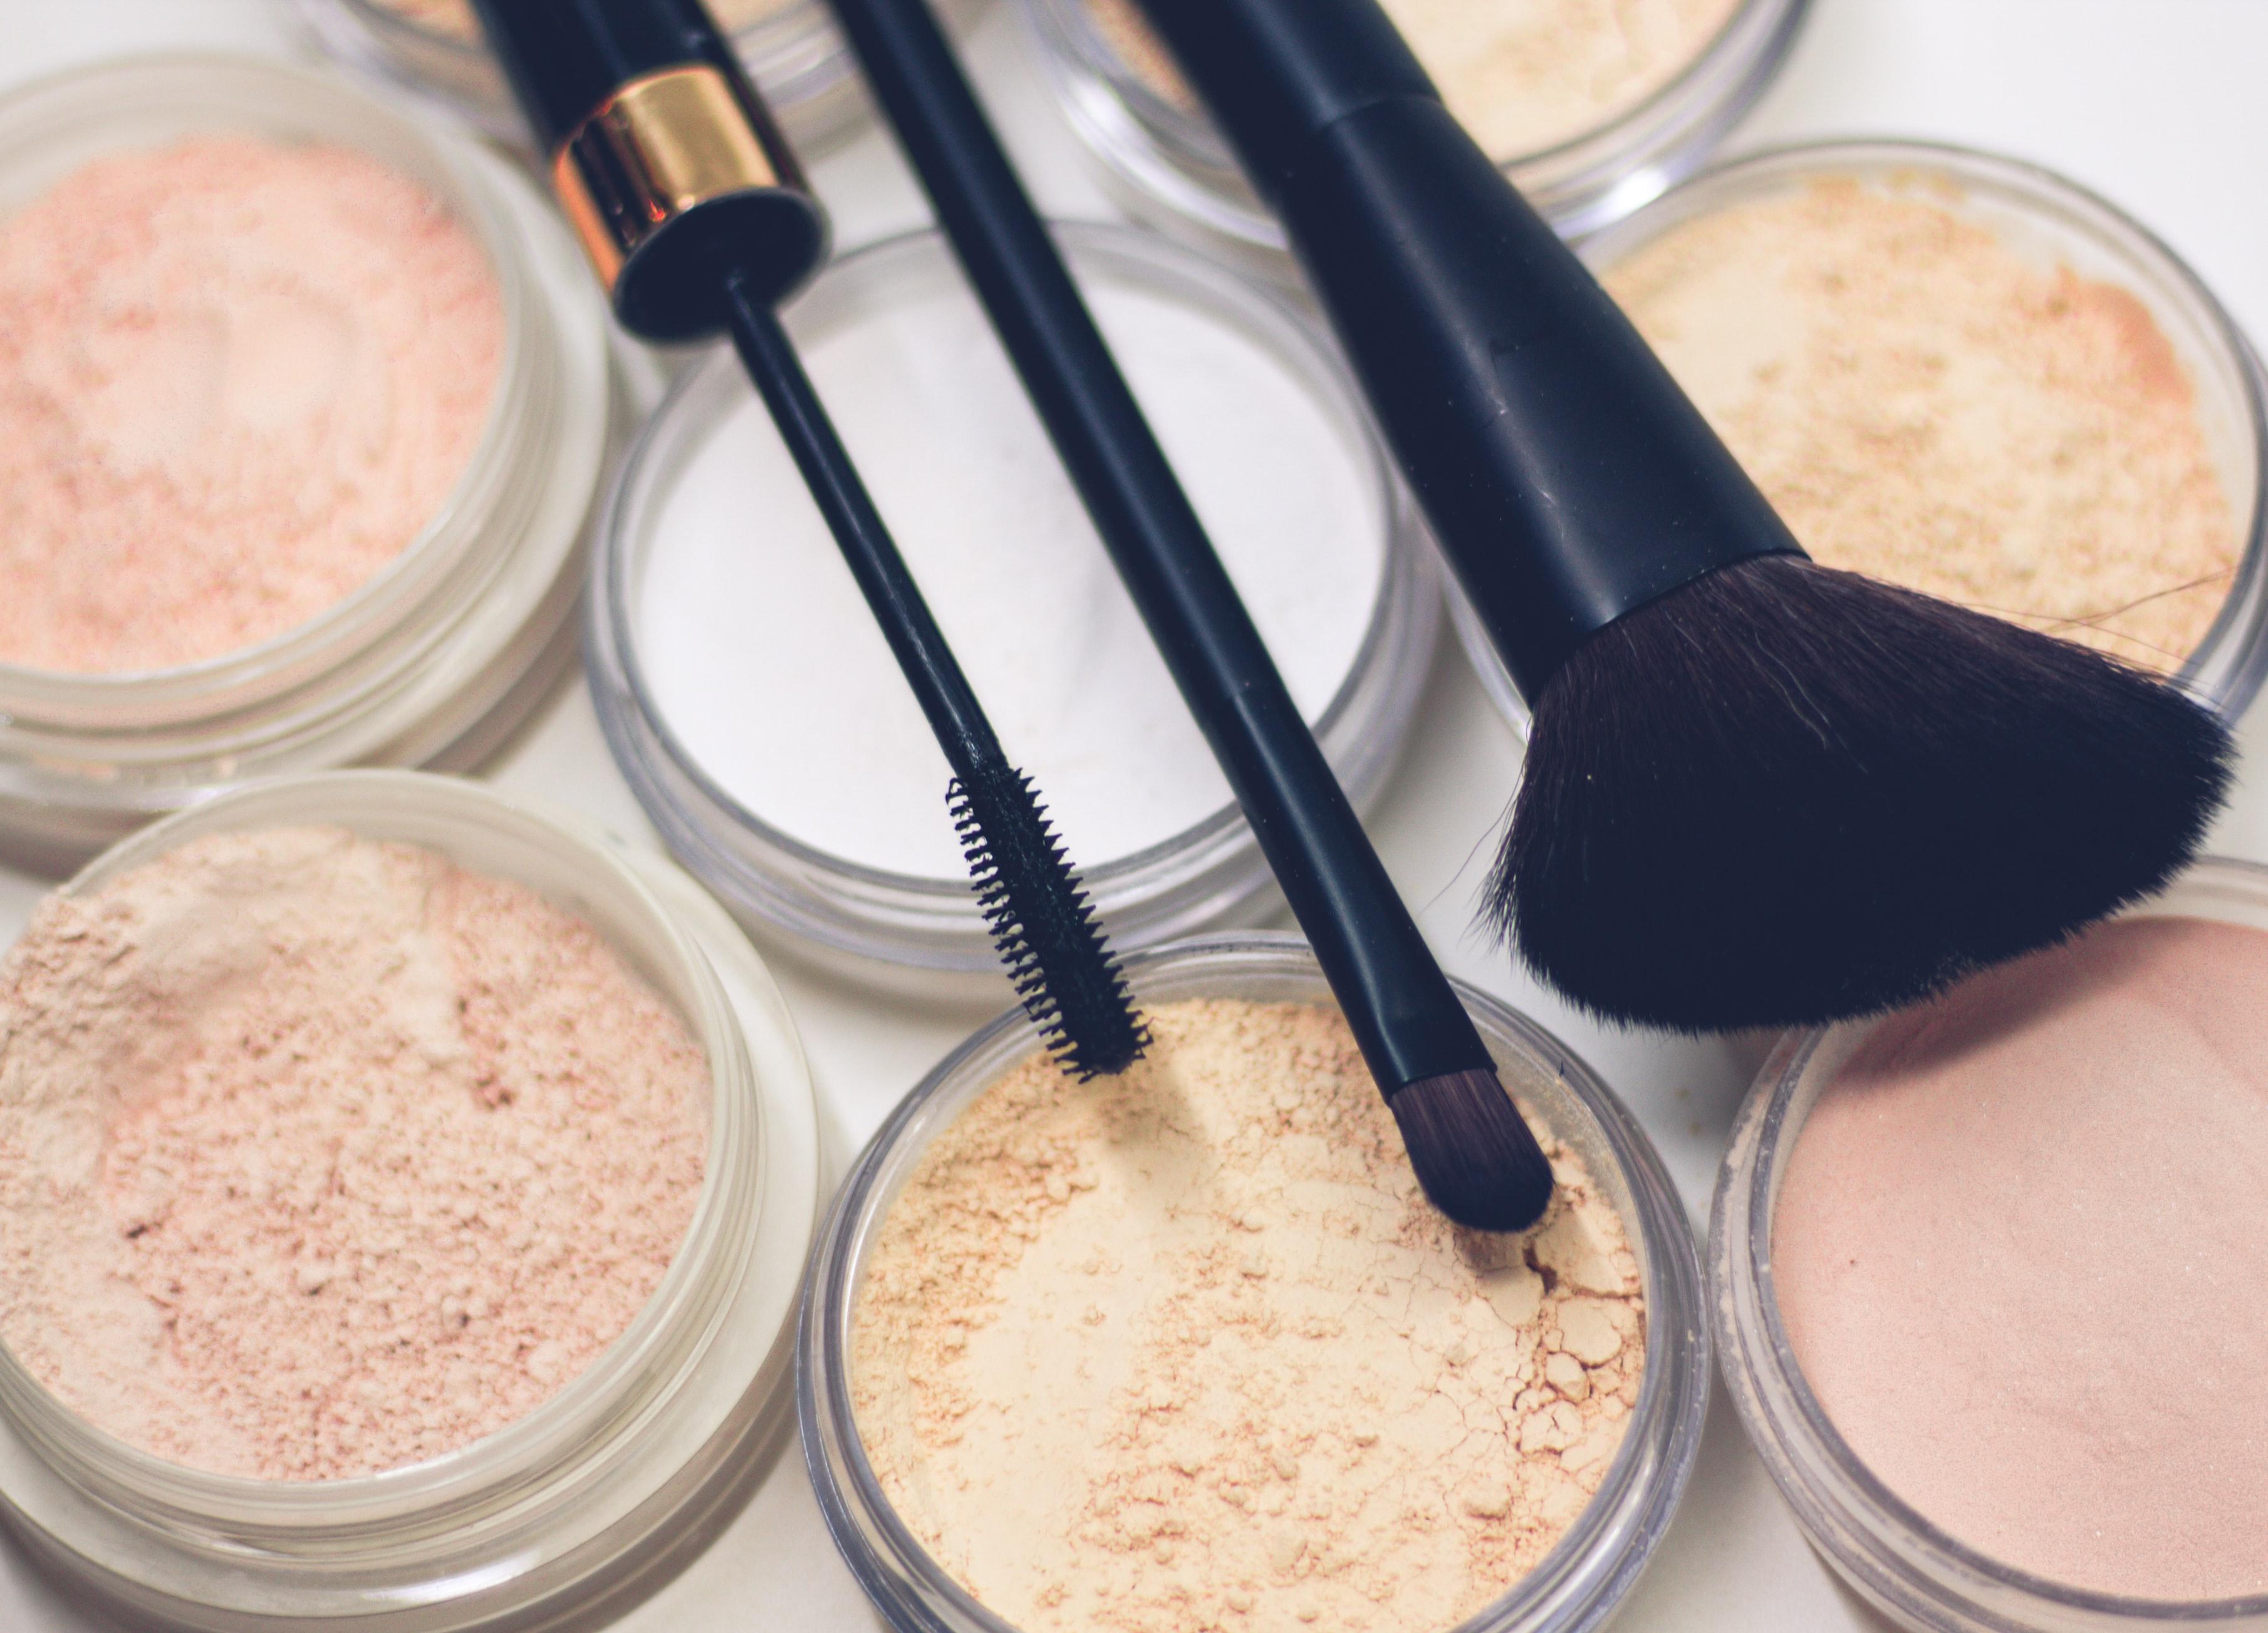 vegan beauty products - Colour corrector